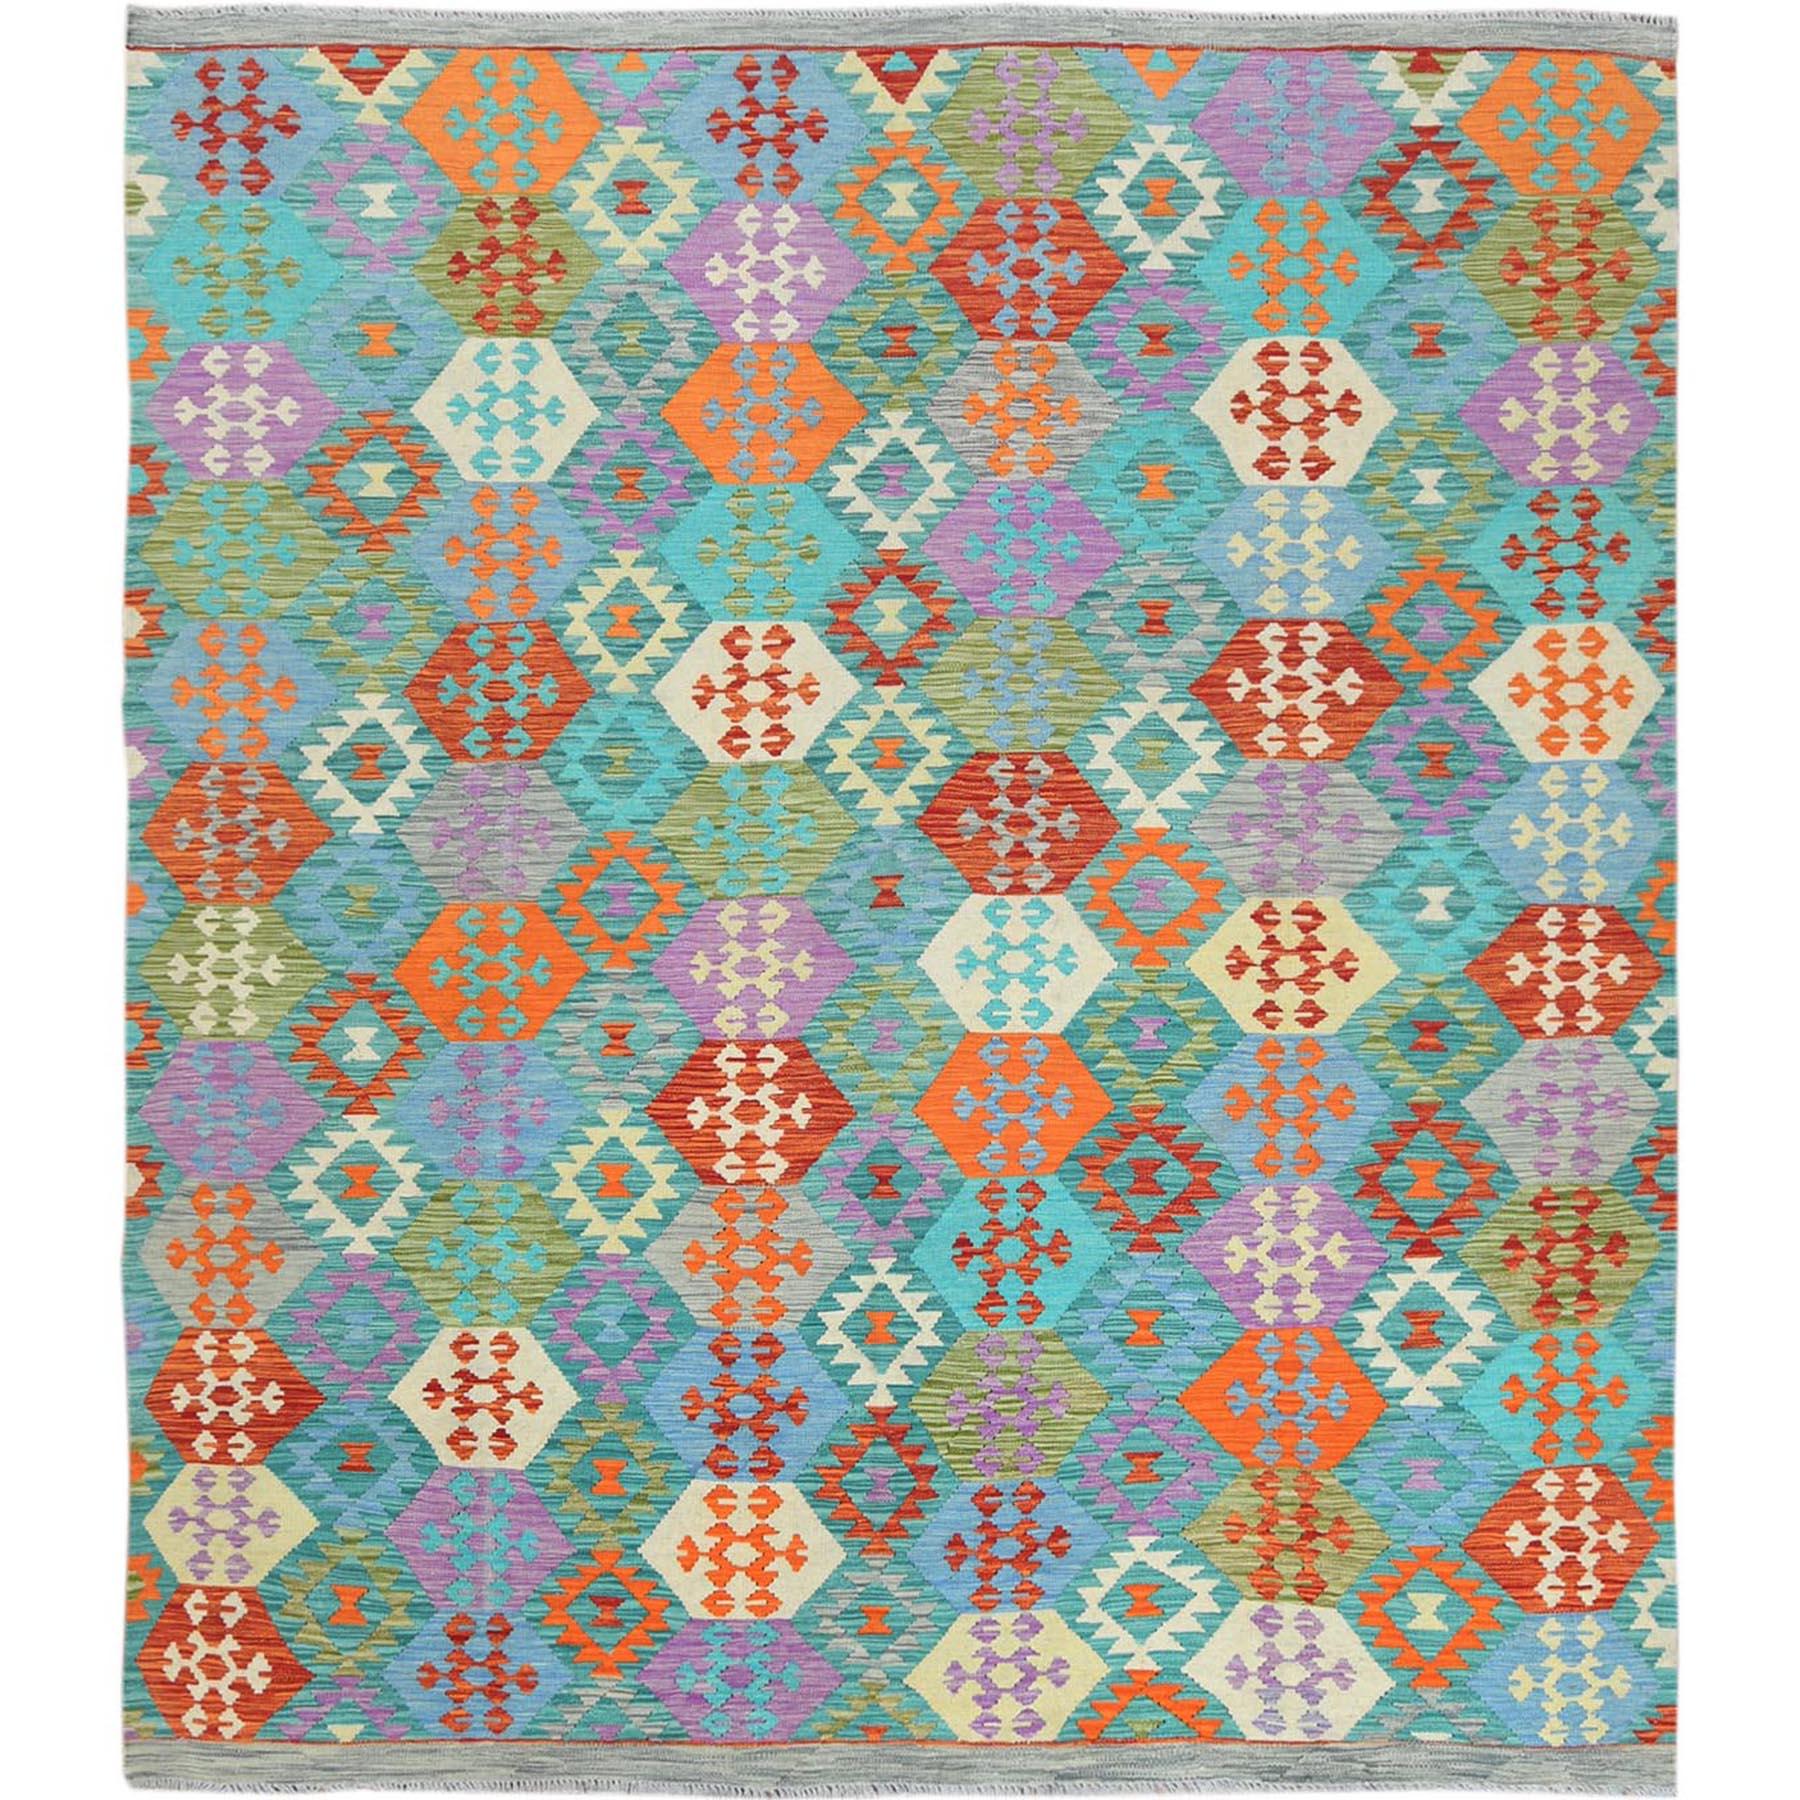 Fine Kilim Collection Hand Woven Teal Rug No: 1121362